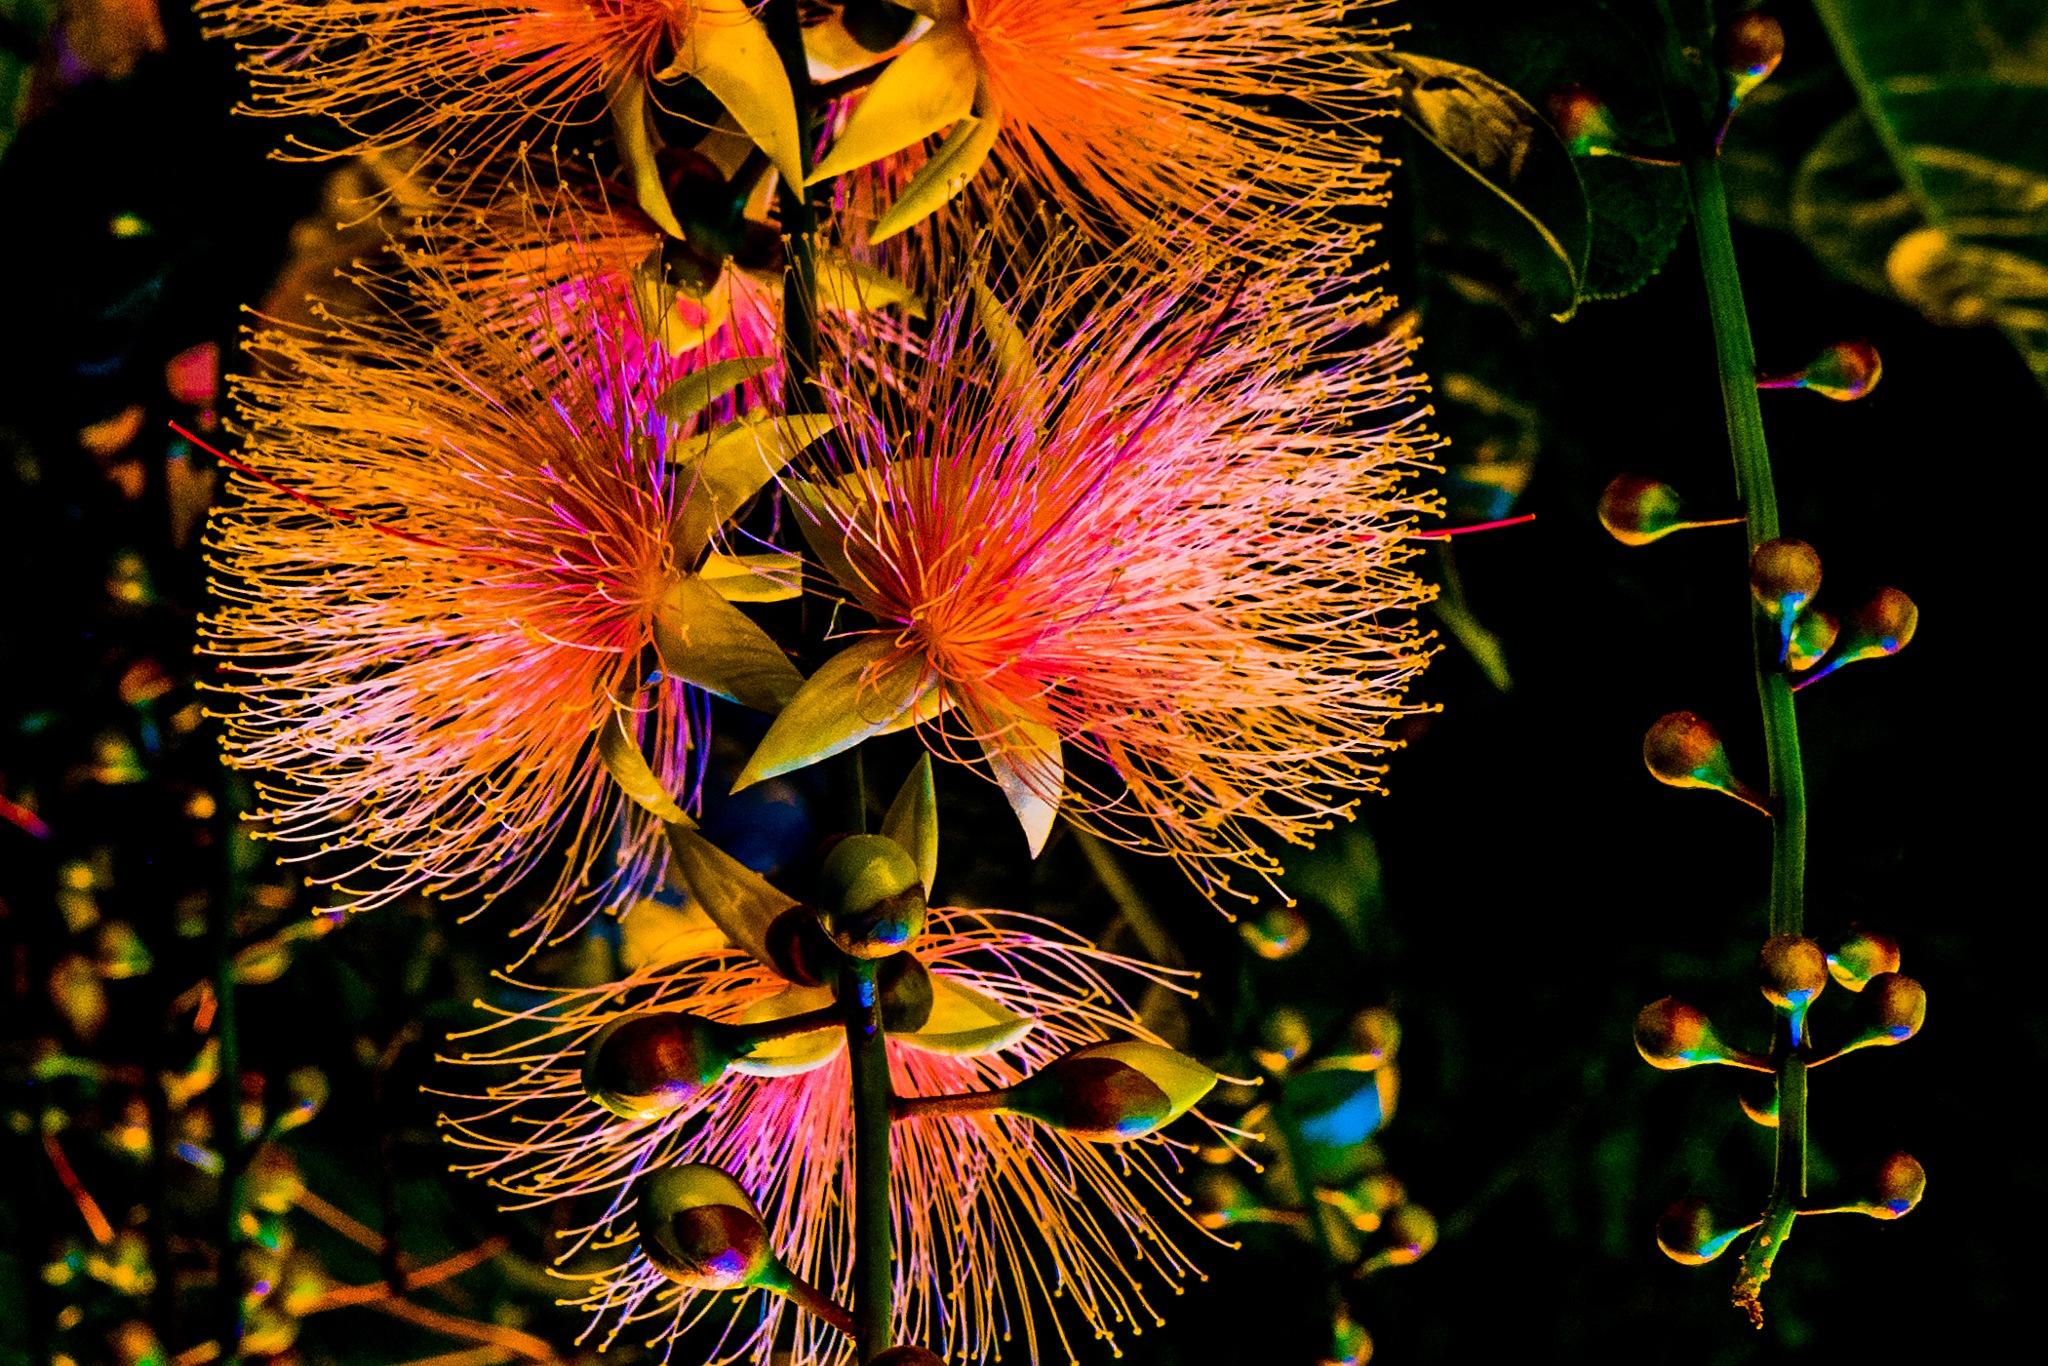 Summer Night Fireworks  by Ladygogo